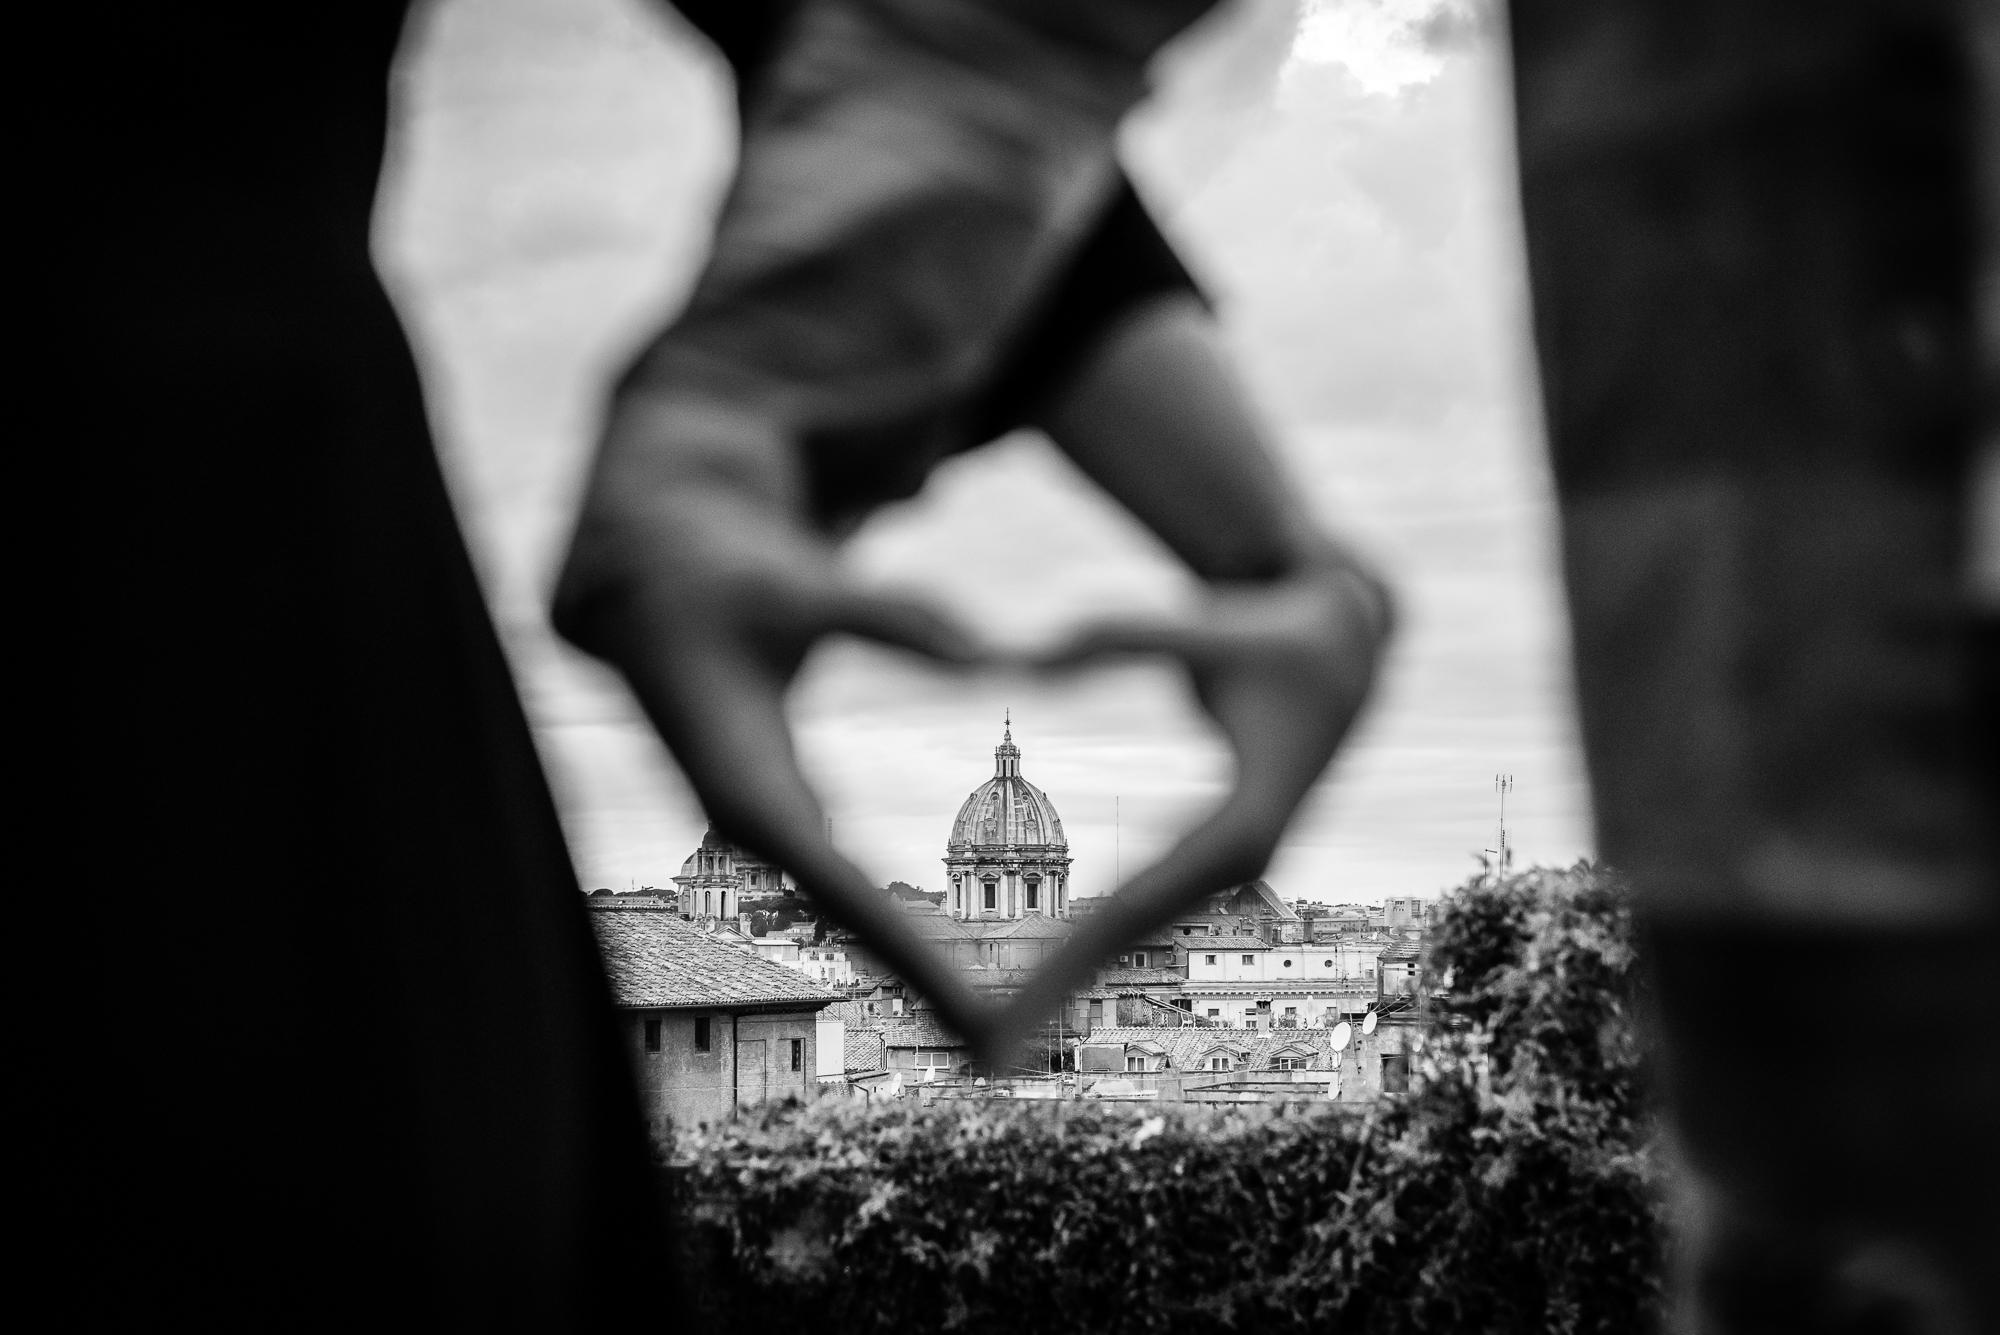 Matrimoni - engagements - ritratti - Latina - roma - Lazio - Italia